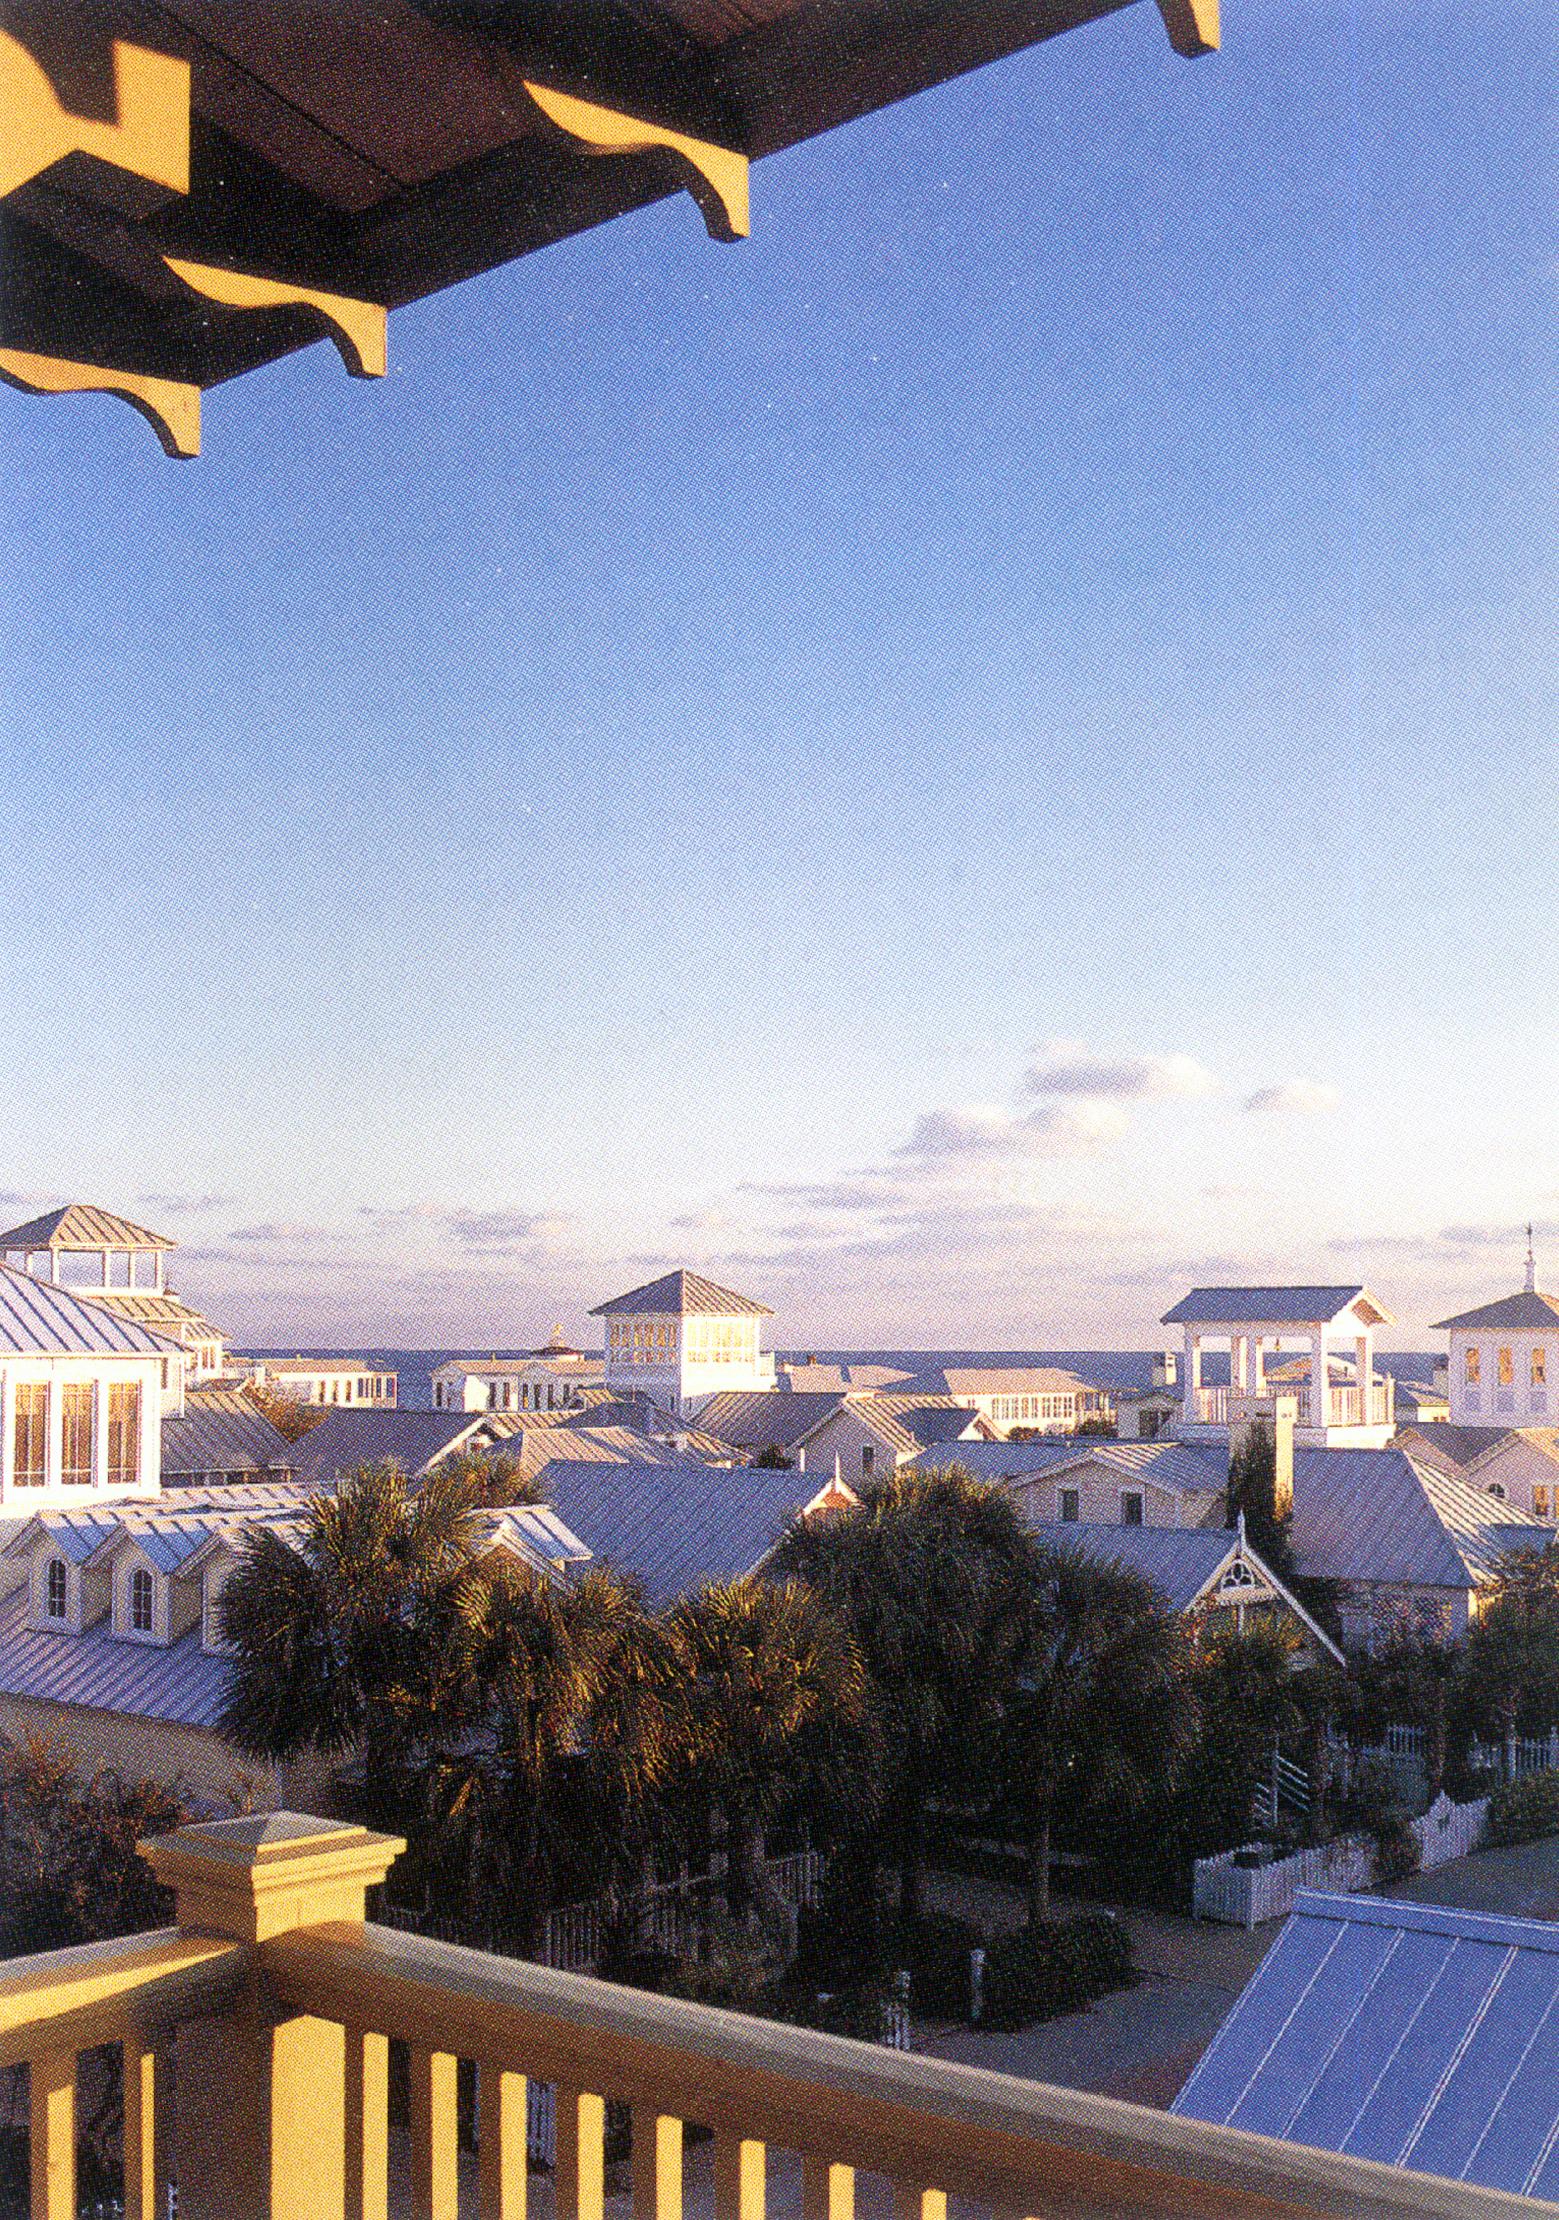 Seaside_Florida.Beach.Natchez_House.New_Urbanism.CNU.Courtyard.Walkable.Robert_Orr_&_Associates.Architecture.Landscape_Architecture.Urbanism.High_Rustler_Porch.jpg